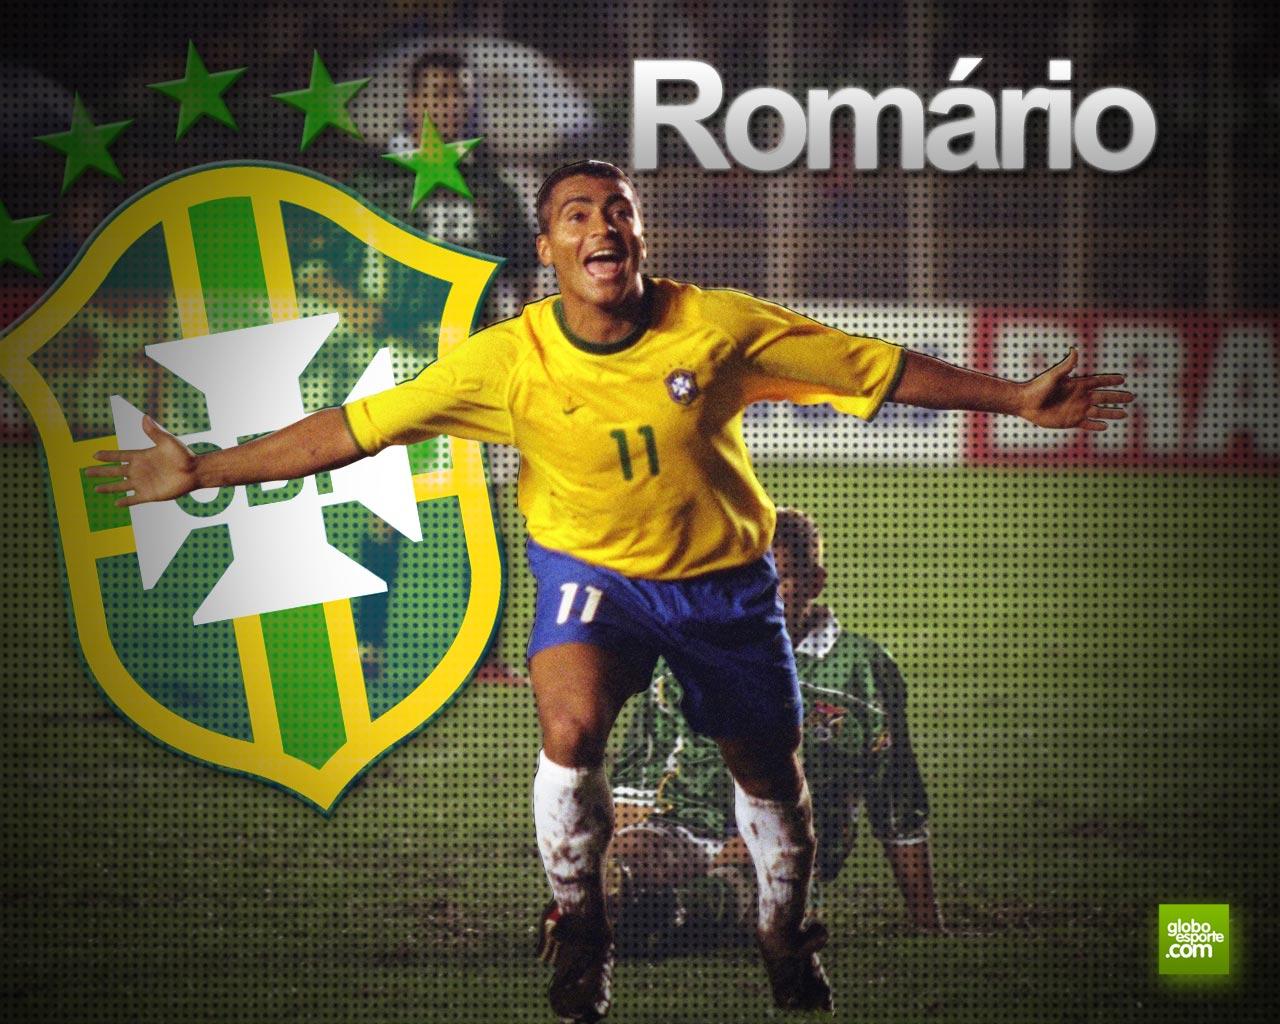 Romario Football Wallpaper